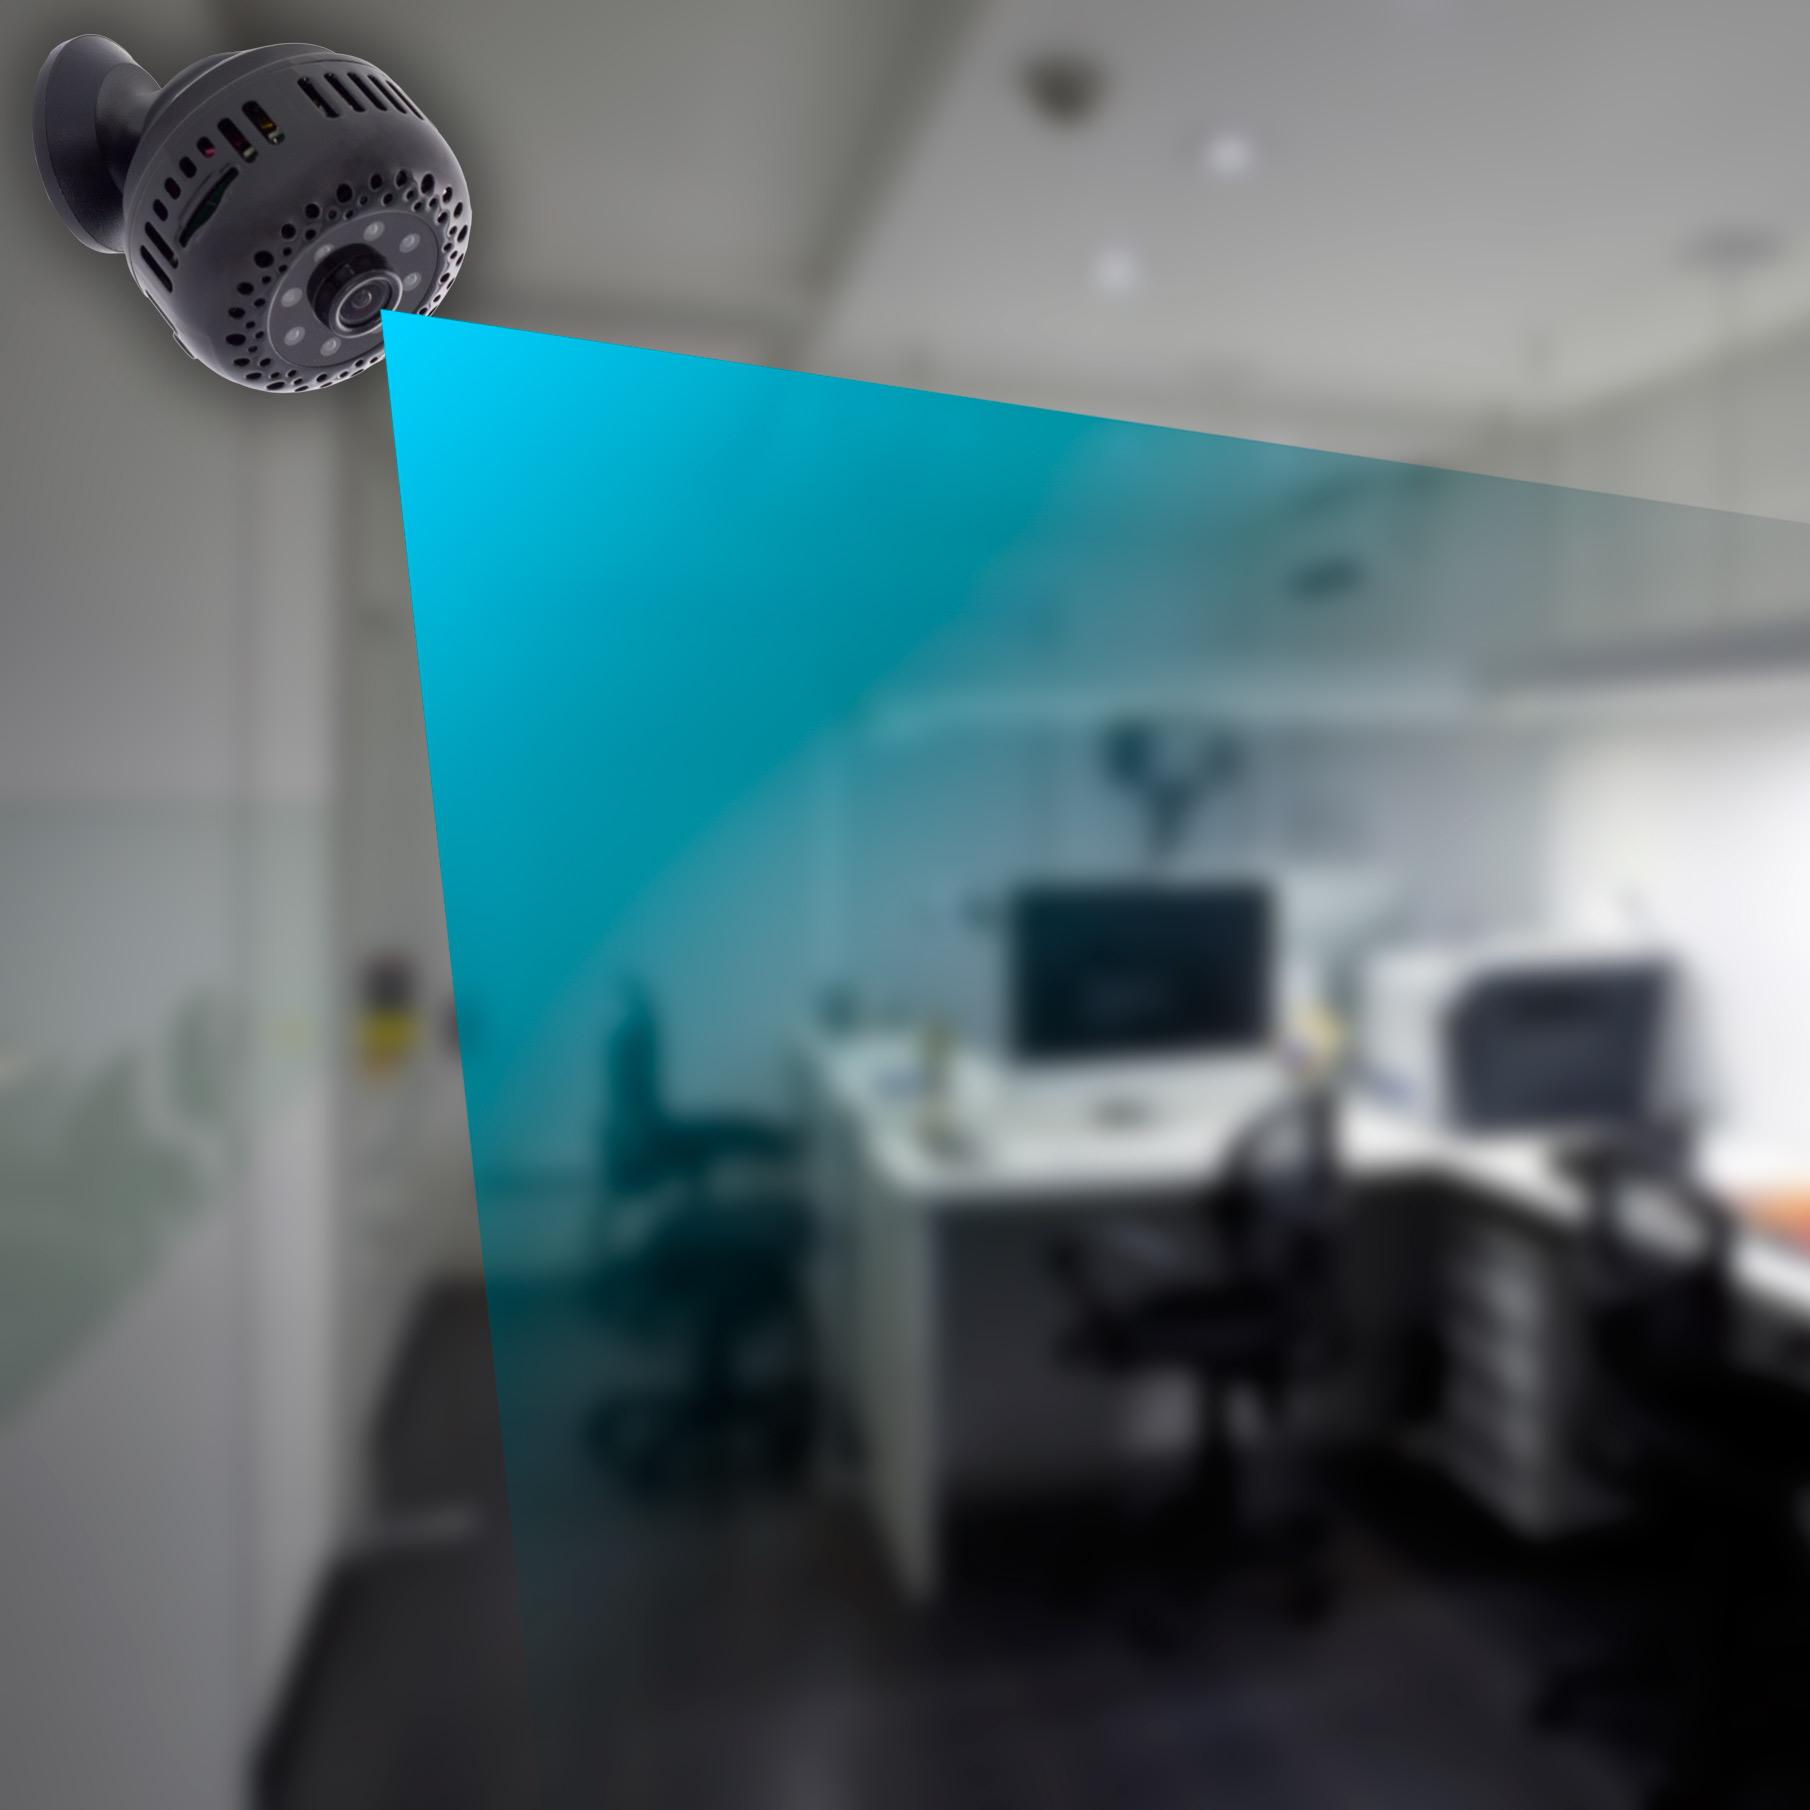 mini-cam-in-use.jpg